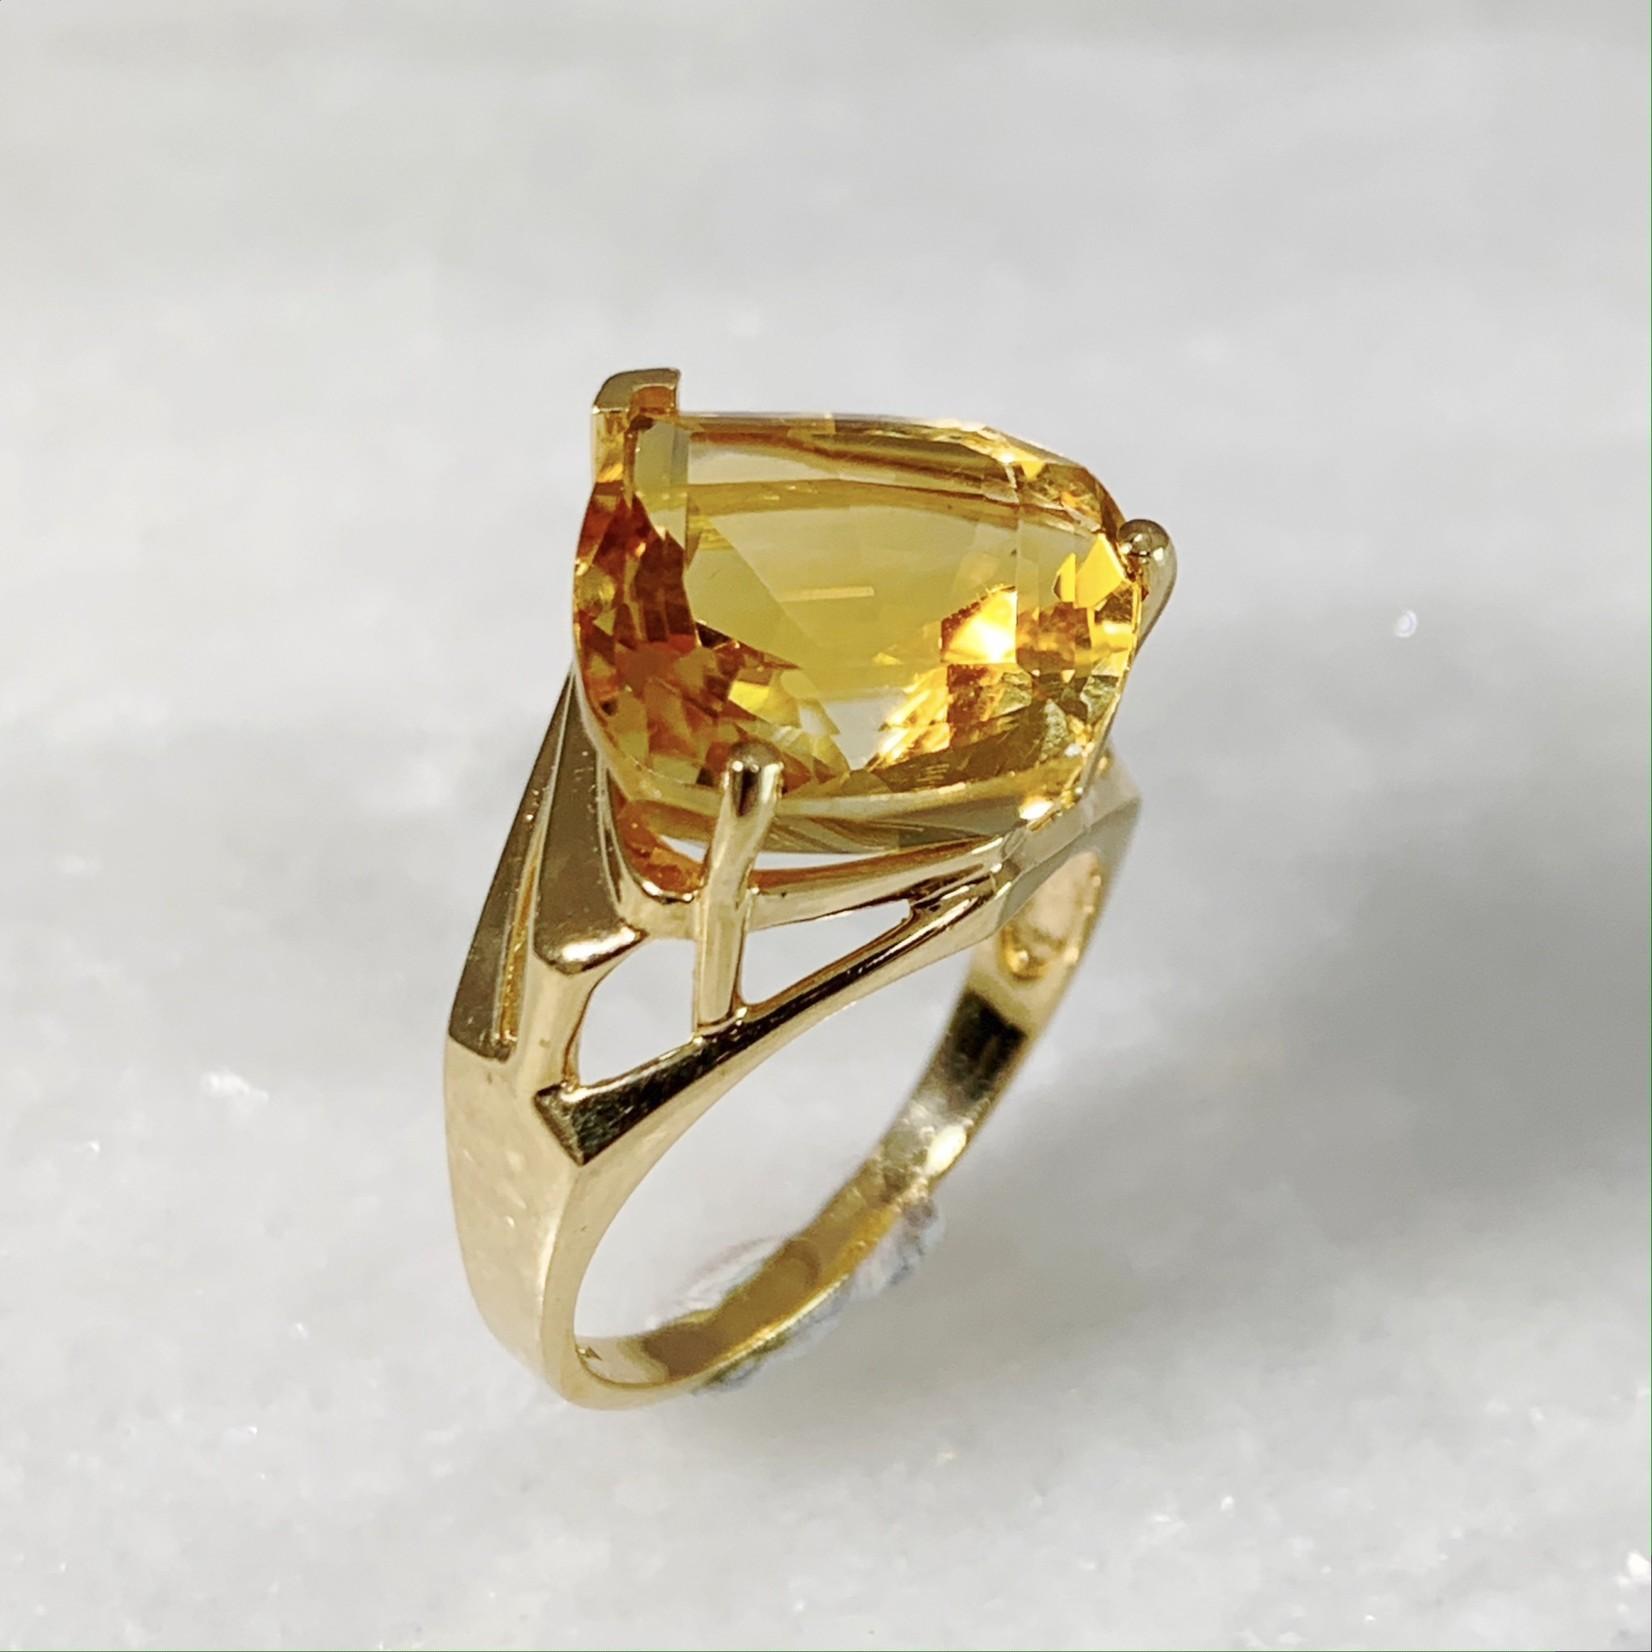 14KY Gold Fancy Shape Citrine Ring